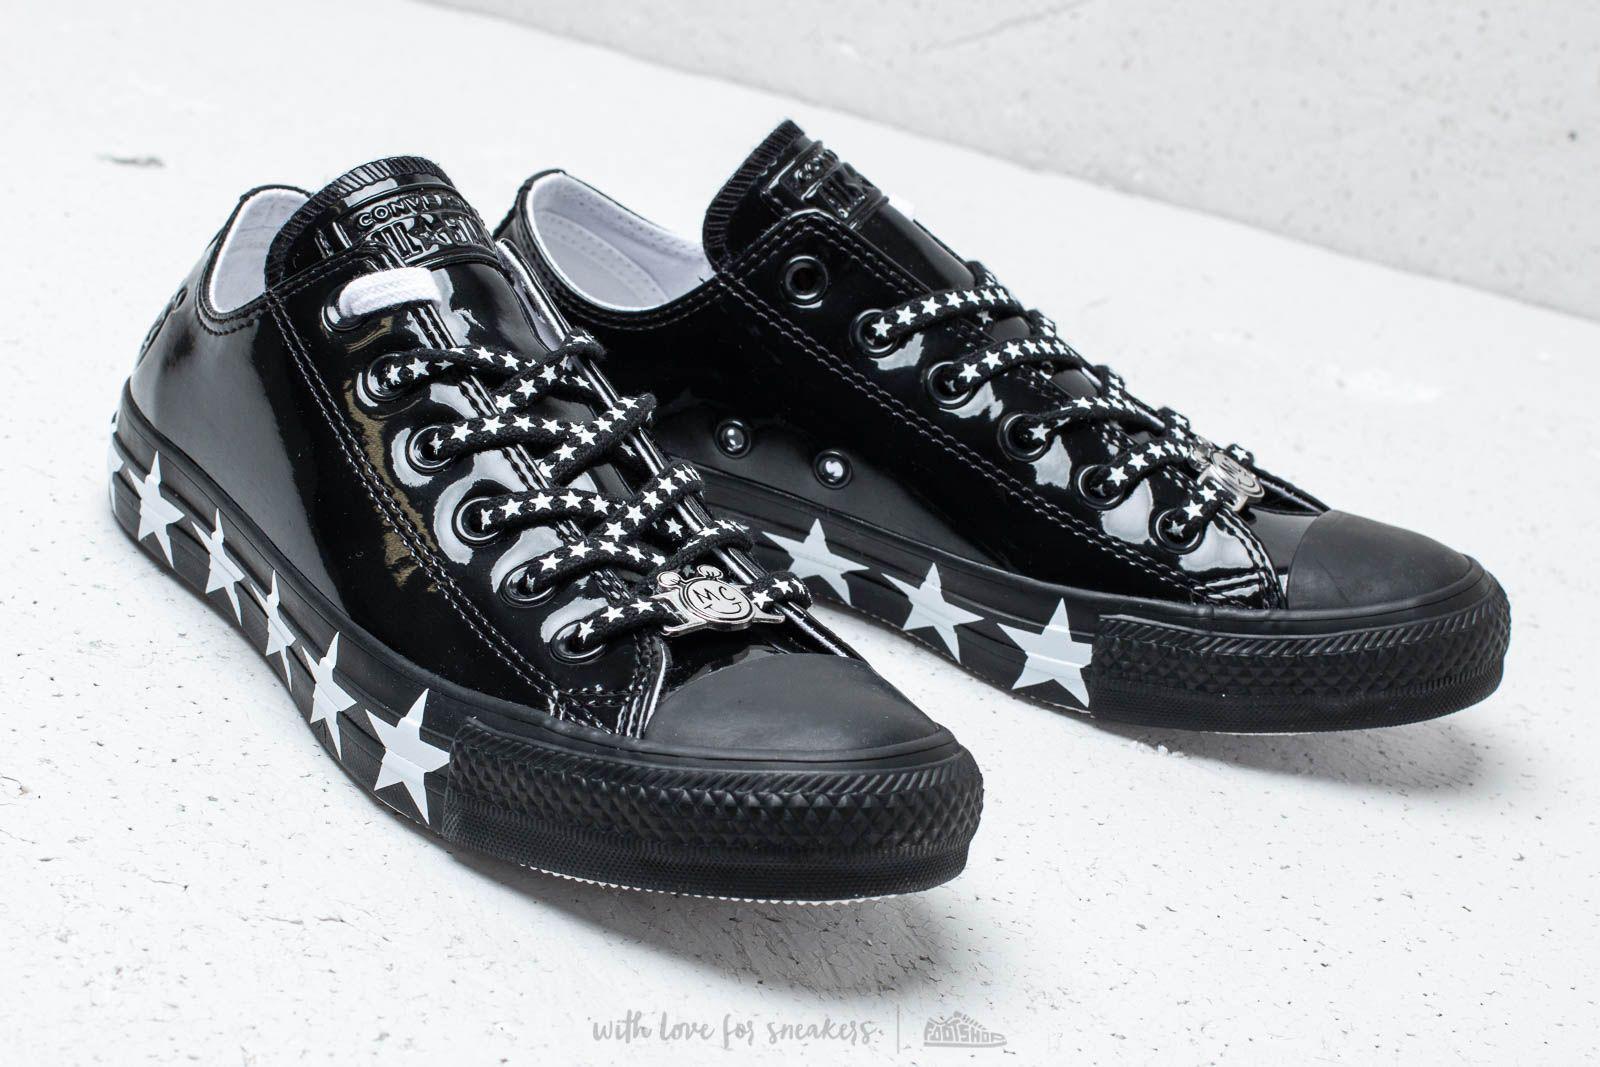 Lyst - Converse X Miley Cyrus Chuck Taylor All Star Ox Black  White ... 4937857e2